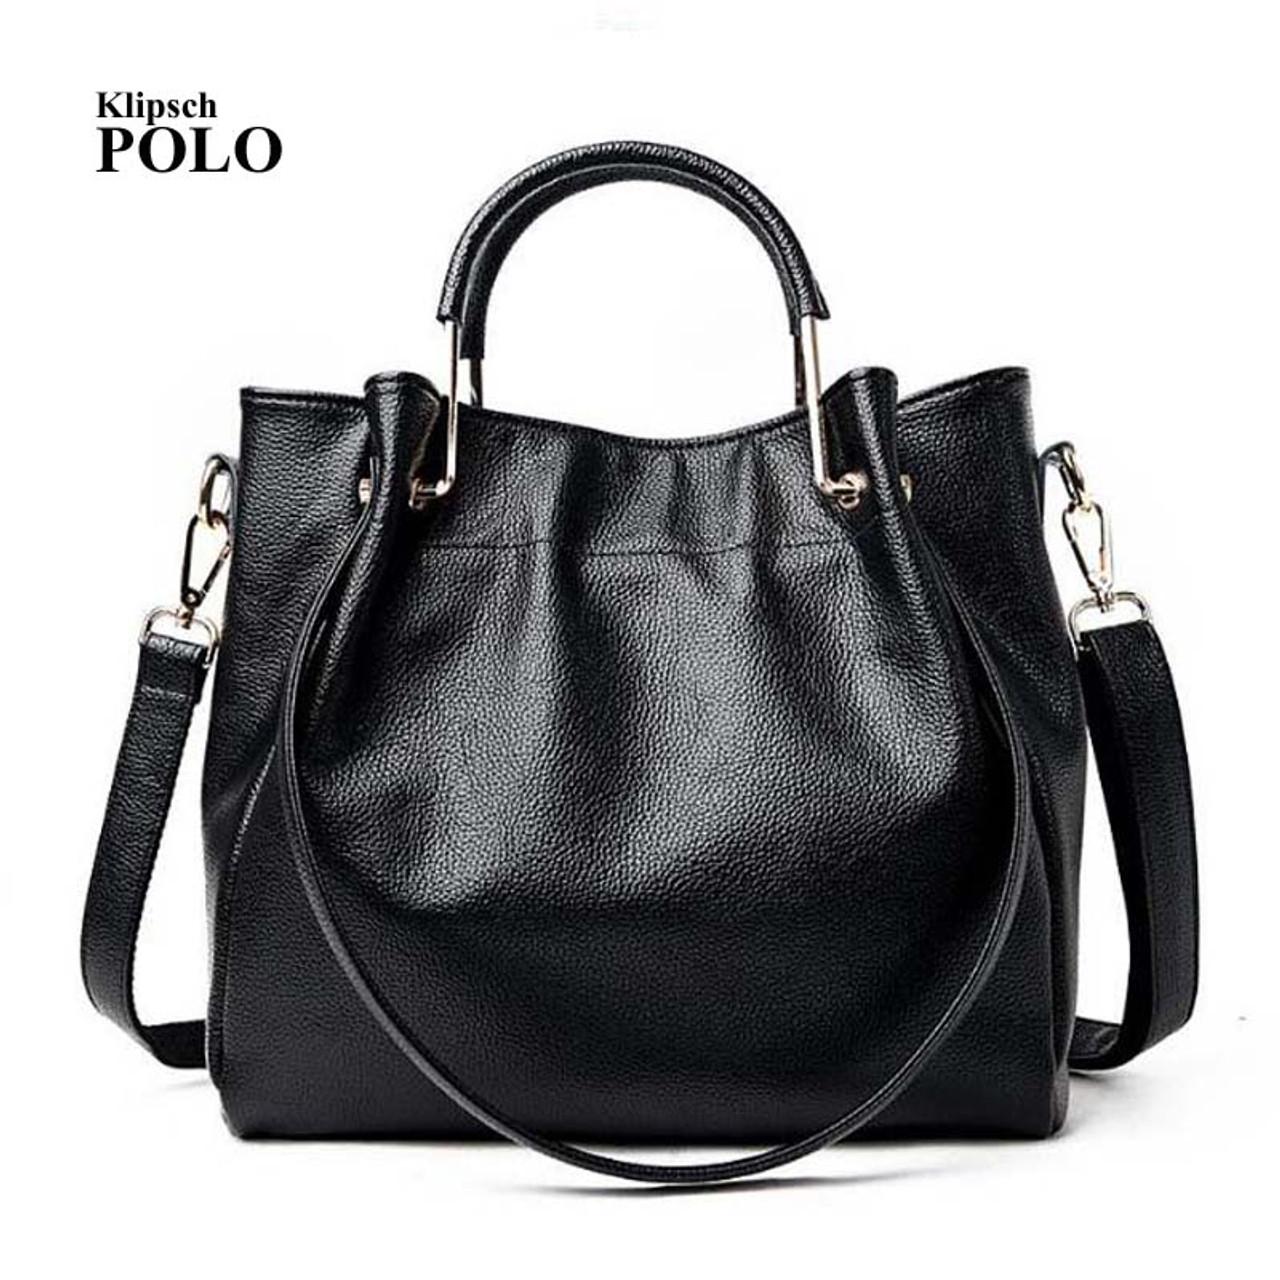 5df1ec115774 100% Real Cowhide Women Handbags Hot Sell genuine leather shoulder bags  fashion simple woman messenger ...